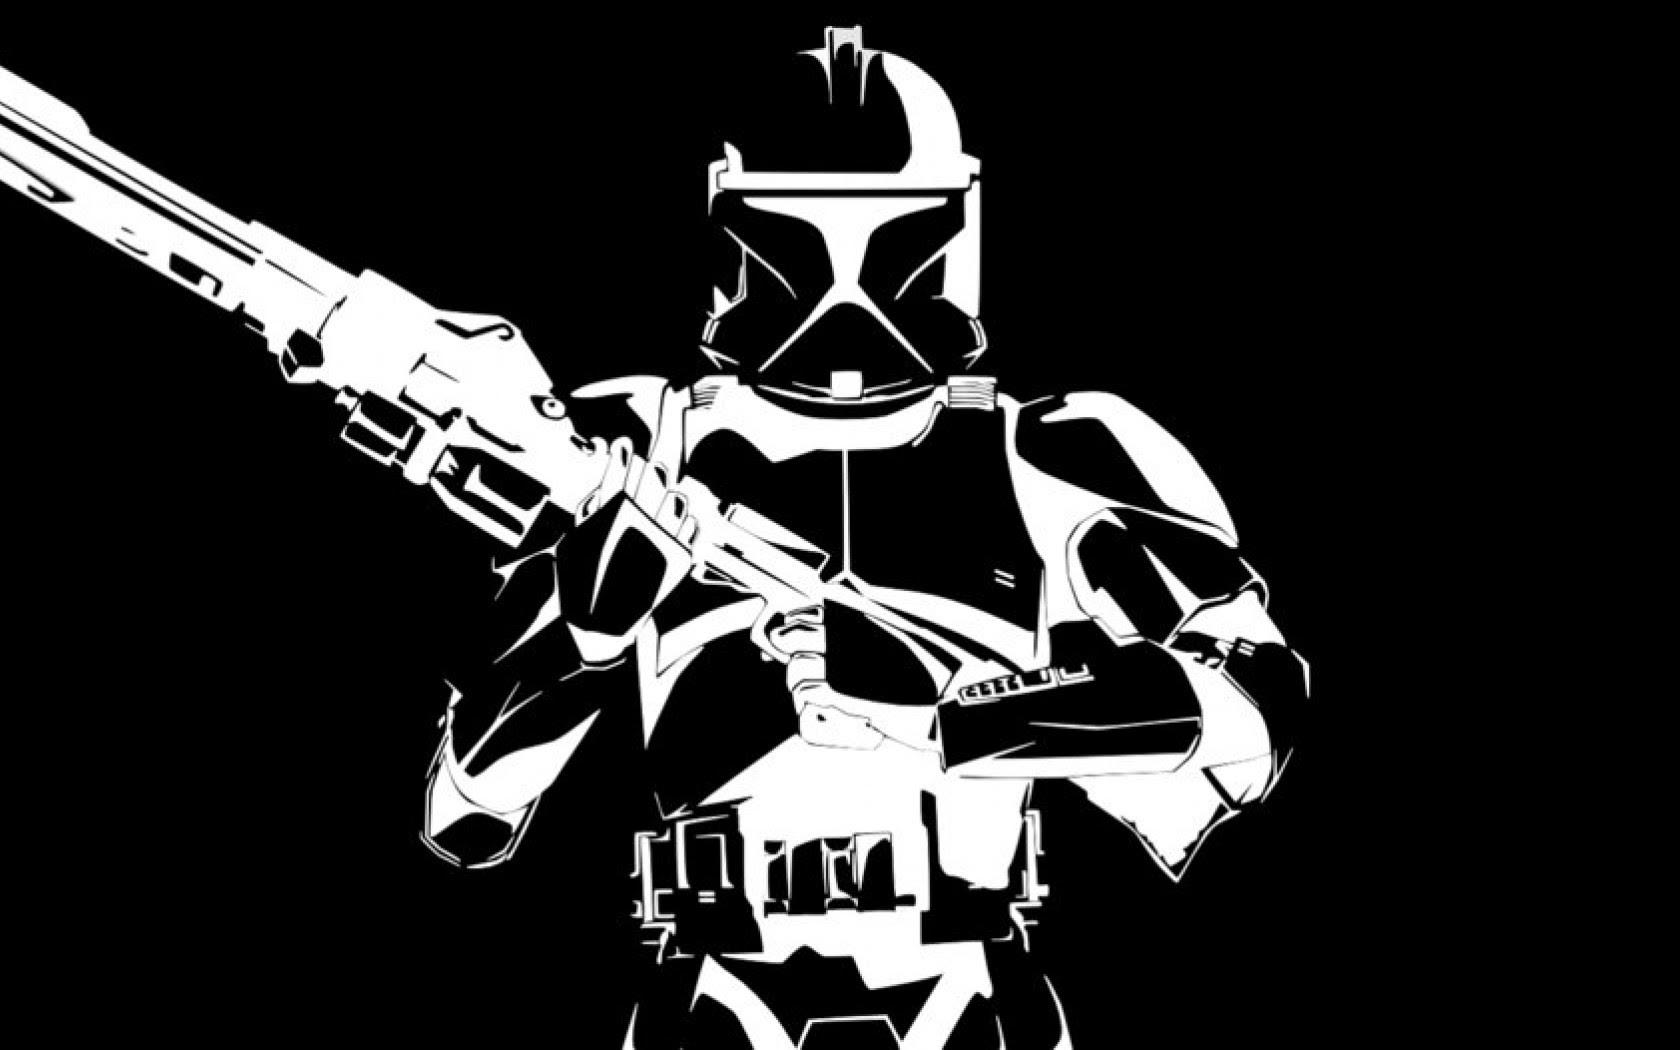 Black And White Star Wars Hd Wallpaper 1680x1050 Hd Wallpaper